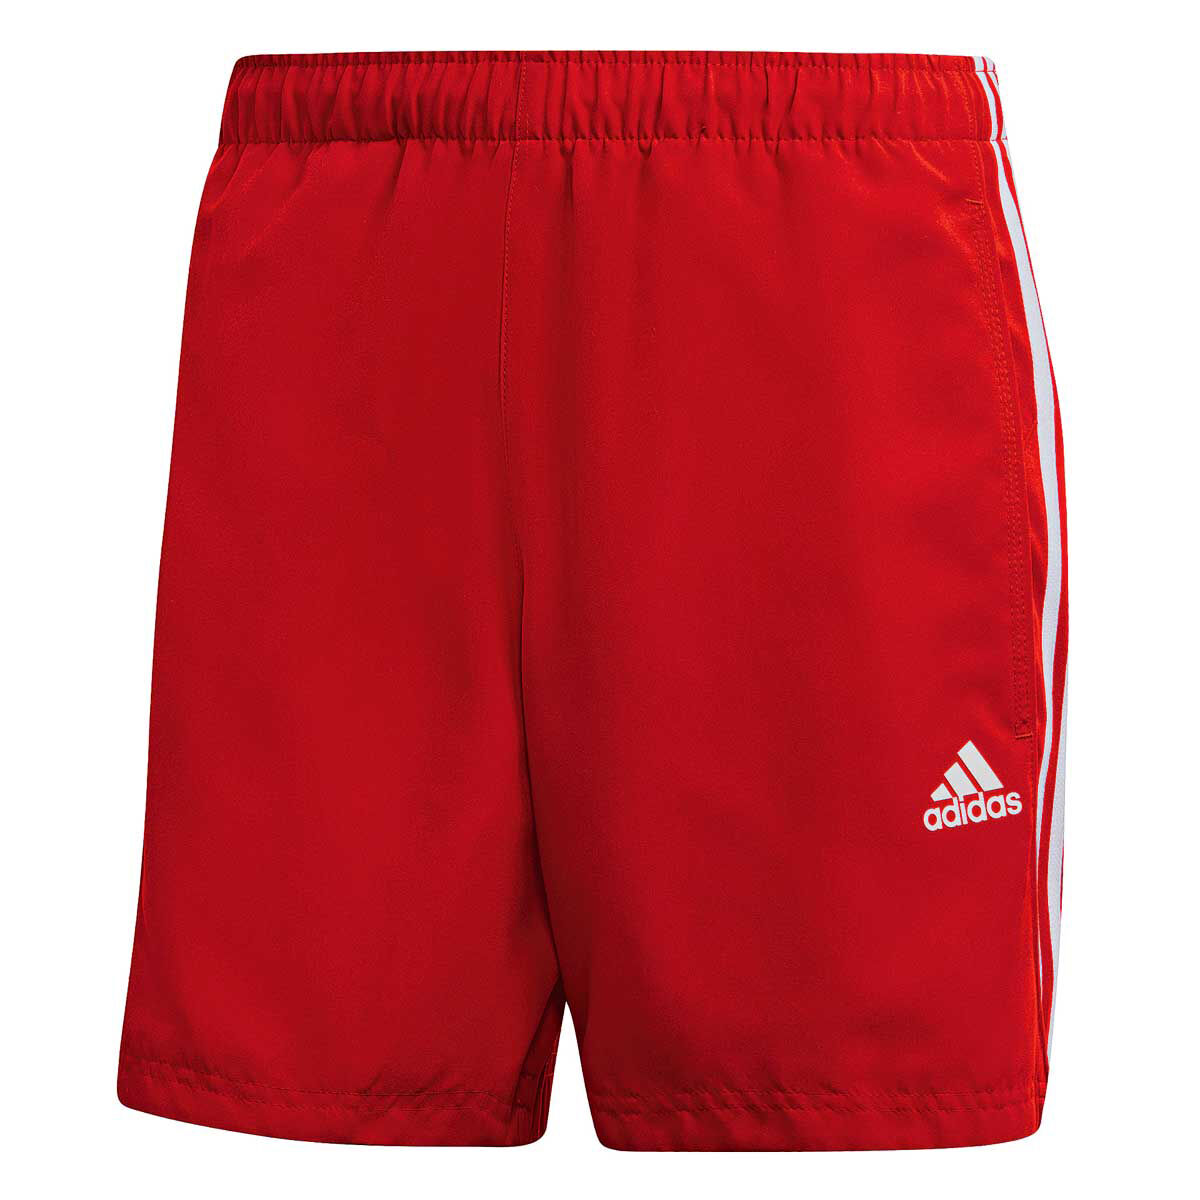 Adidas Chelsea 3 Essentials Shorts Mens Stripe UGzMVpqS